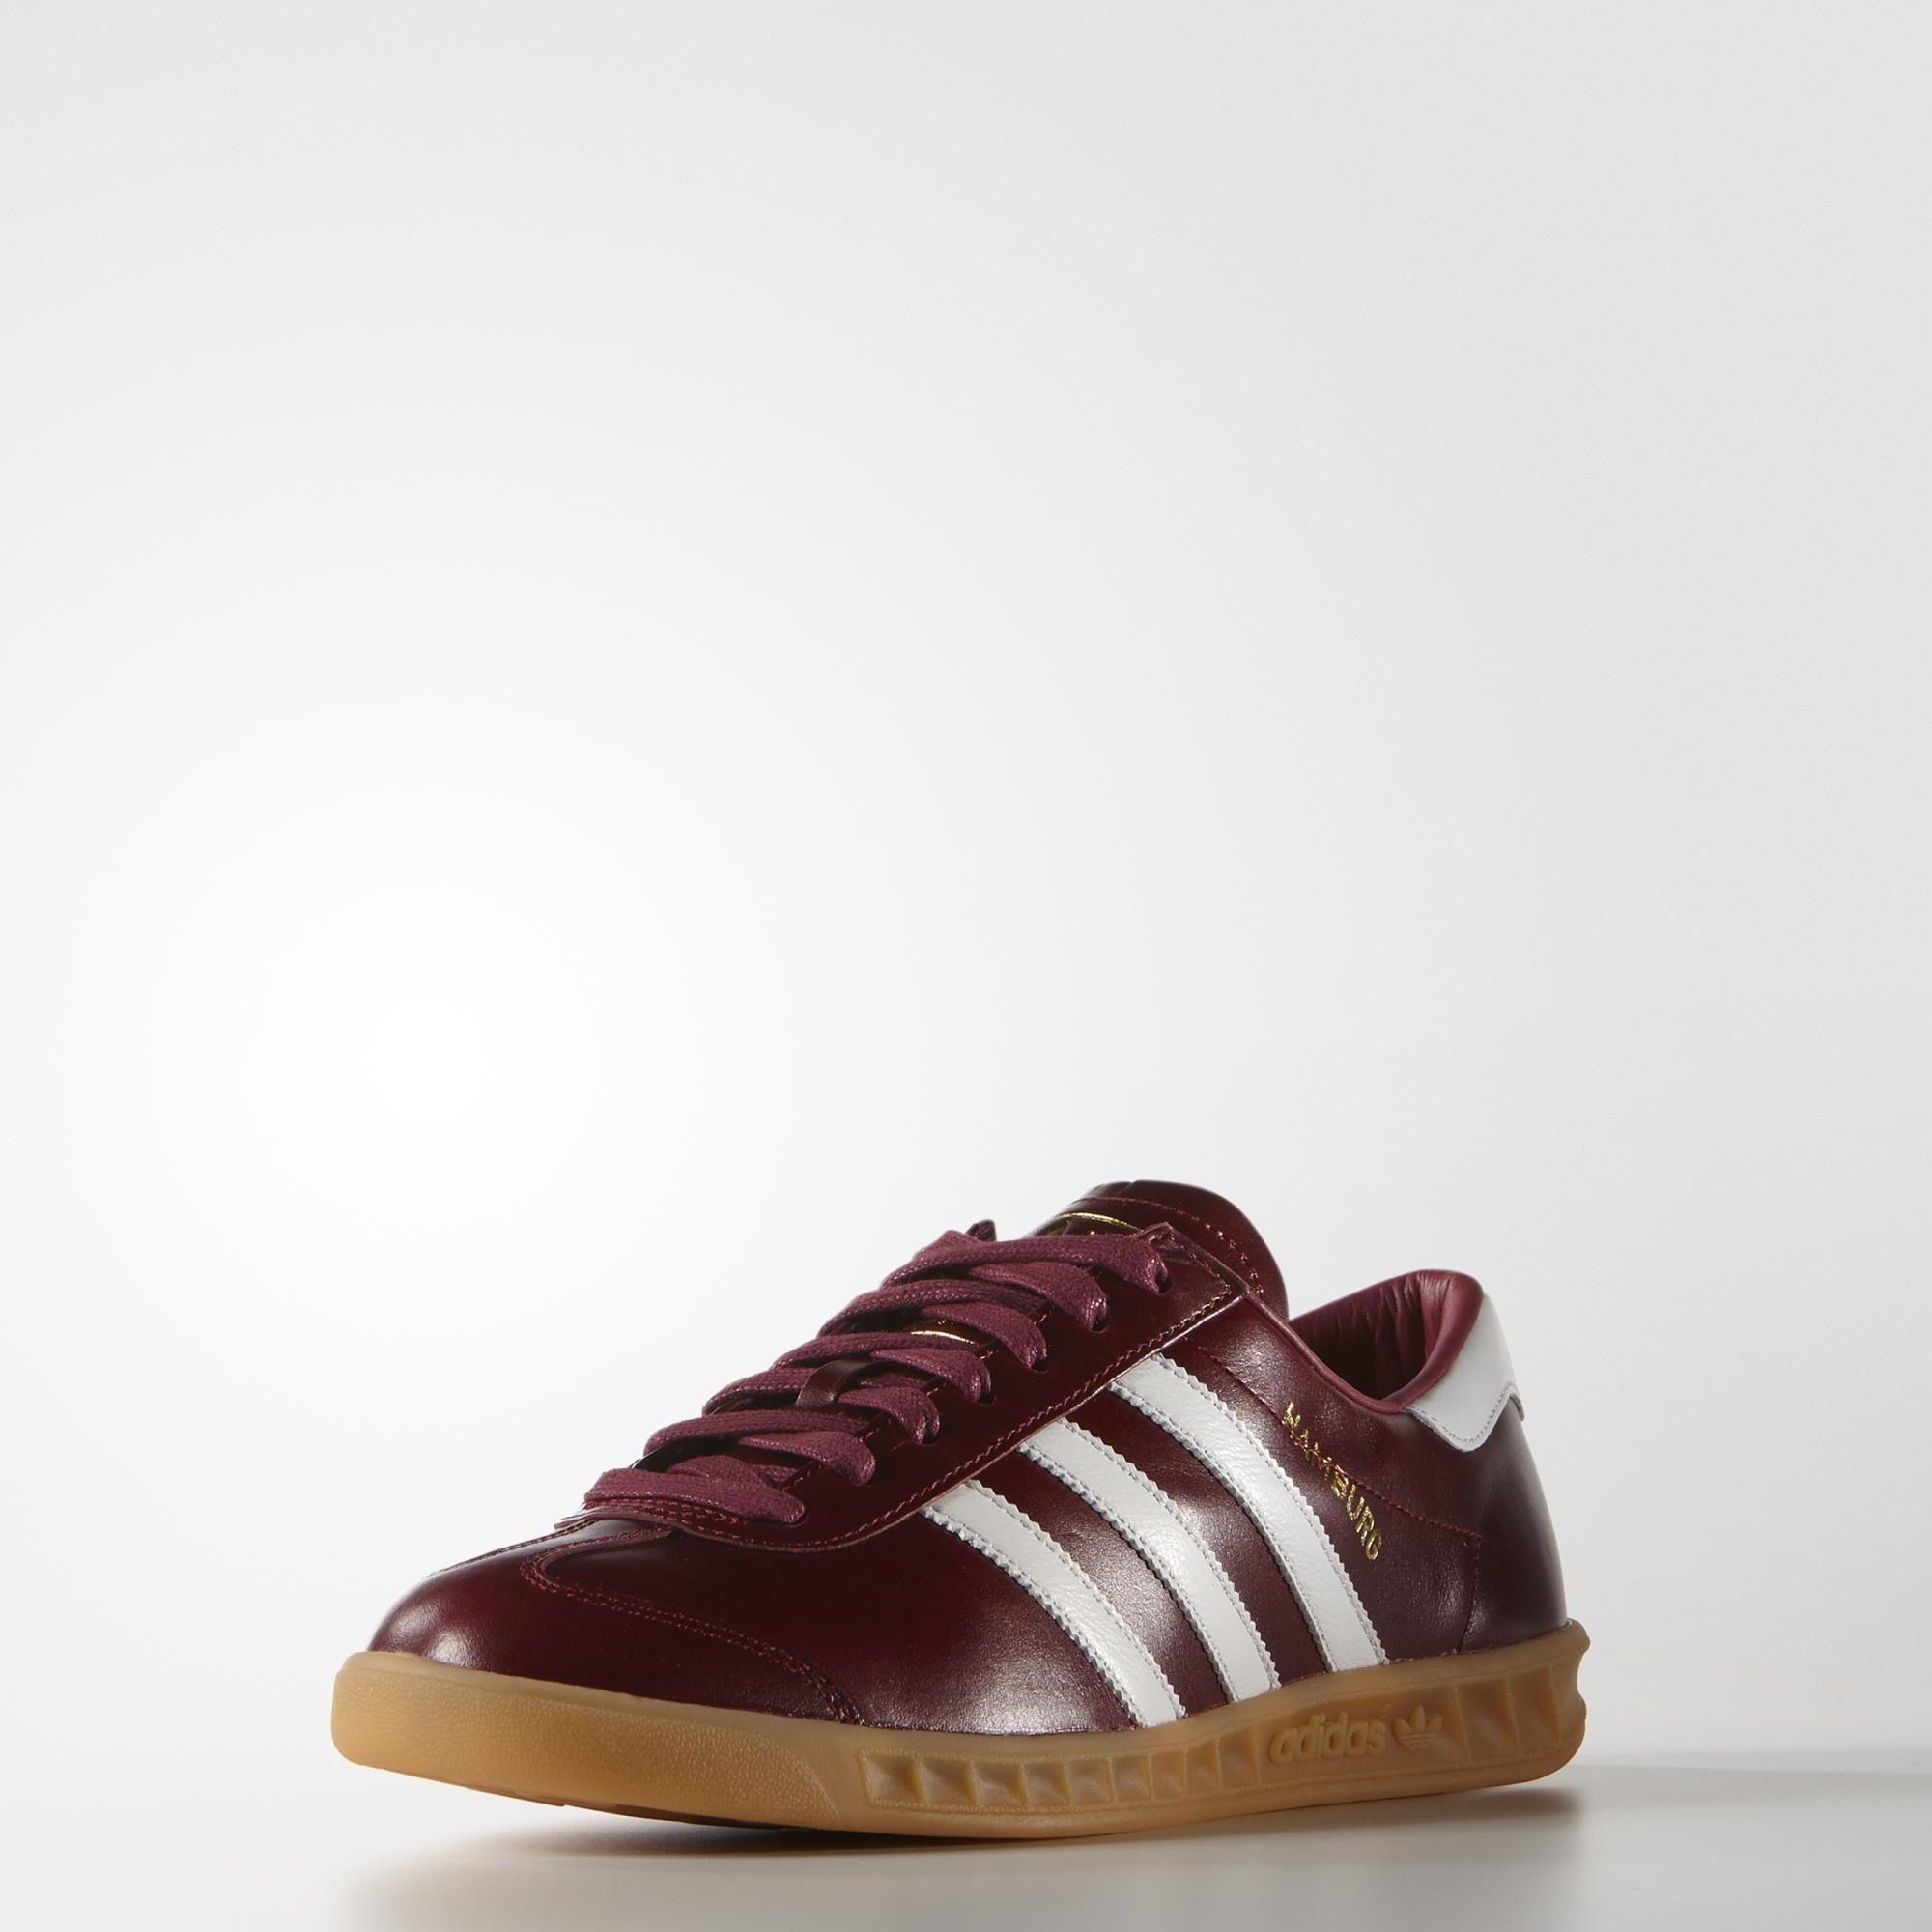 Adidas Originals Hamburg made in Germany | Adidas, Adidas